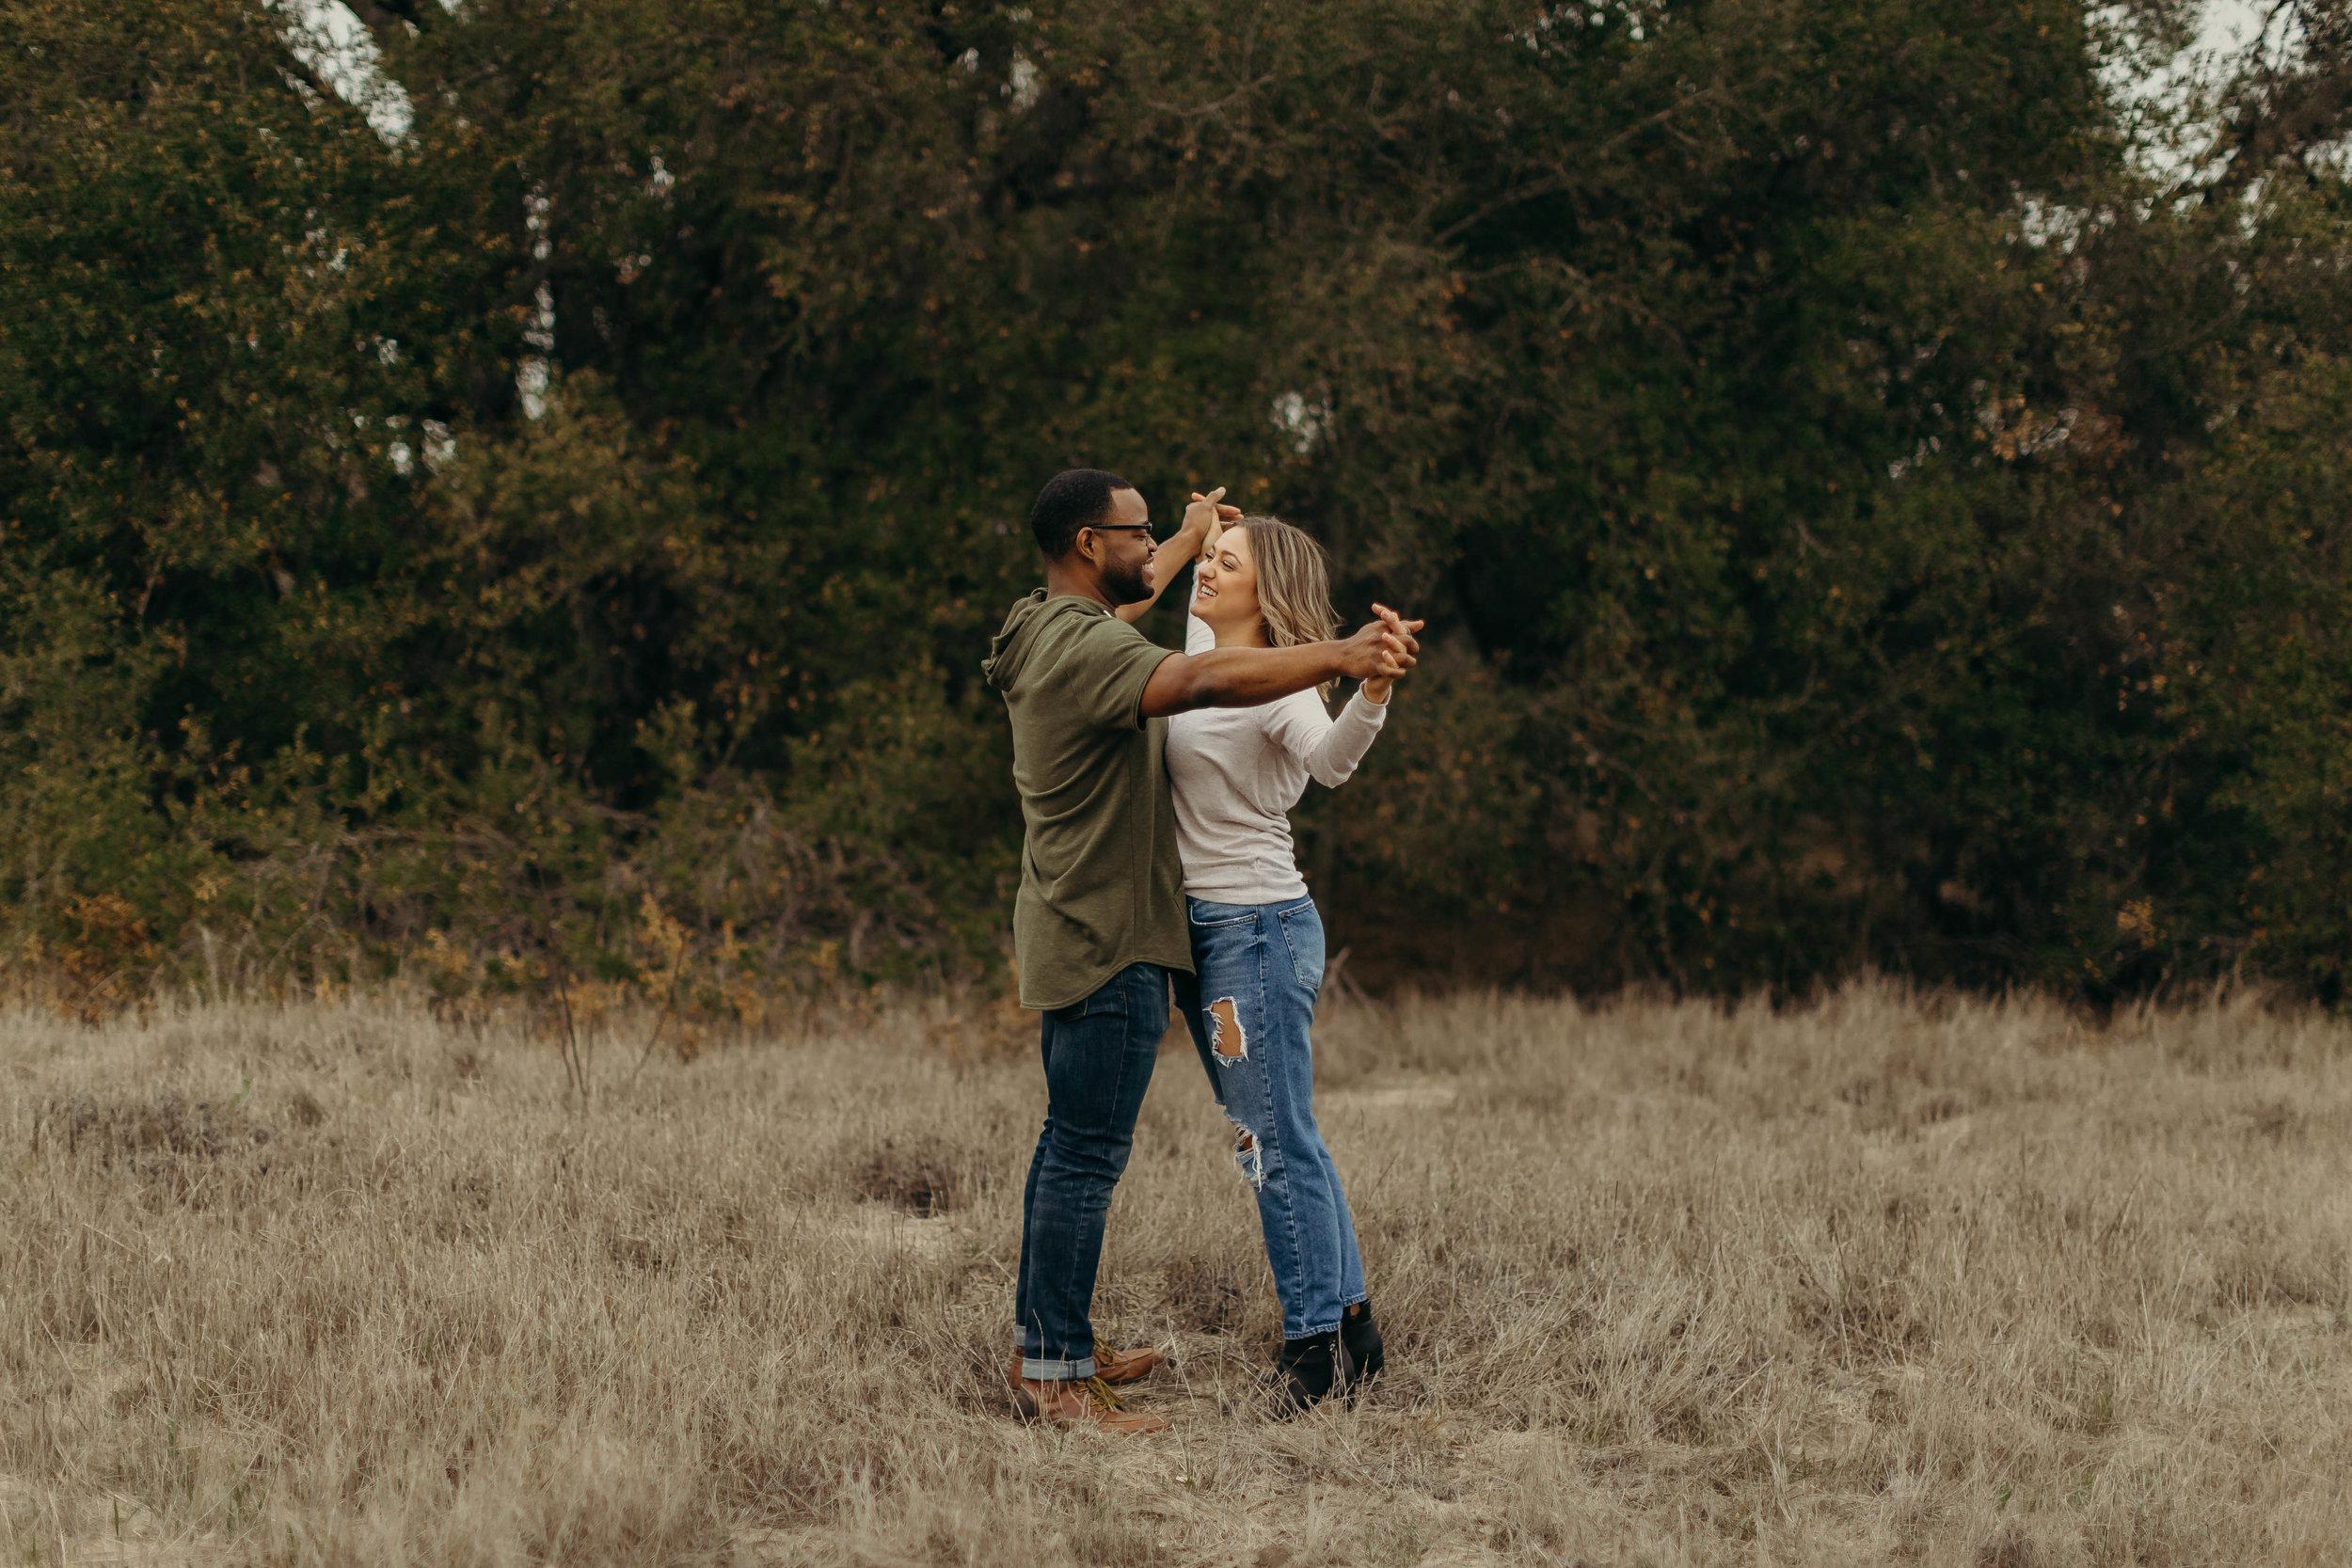 Megan and Joshua_Couples Session_2018_Previews-30.jpg